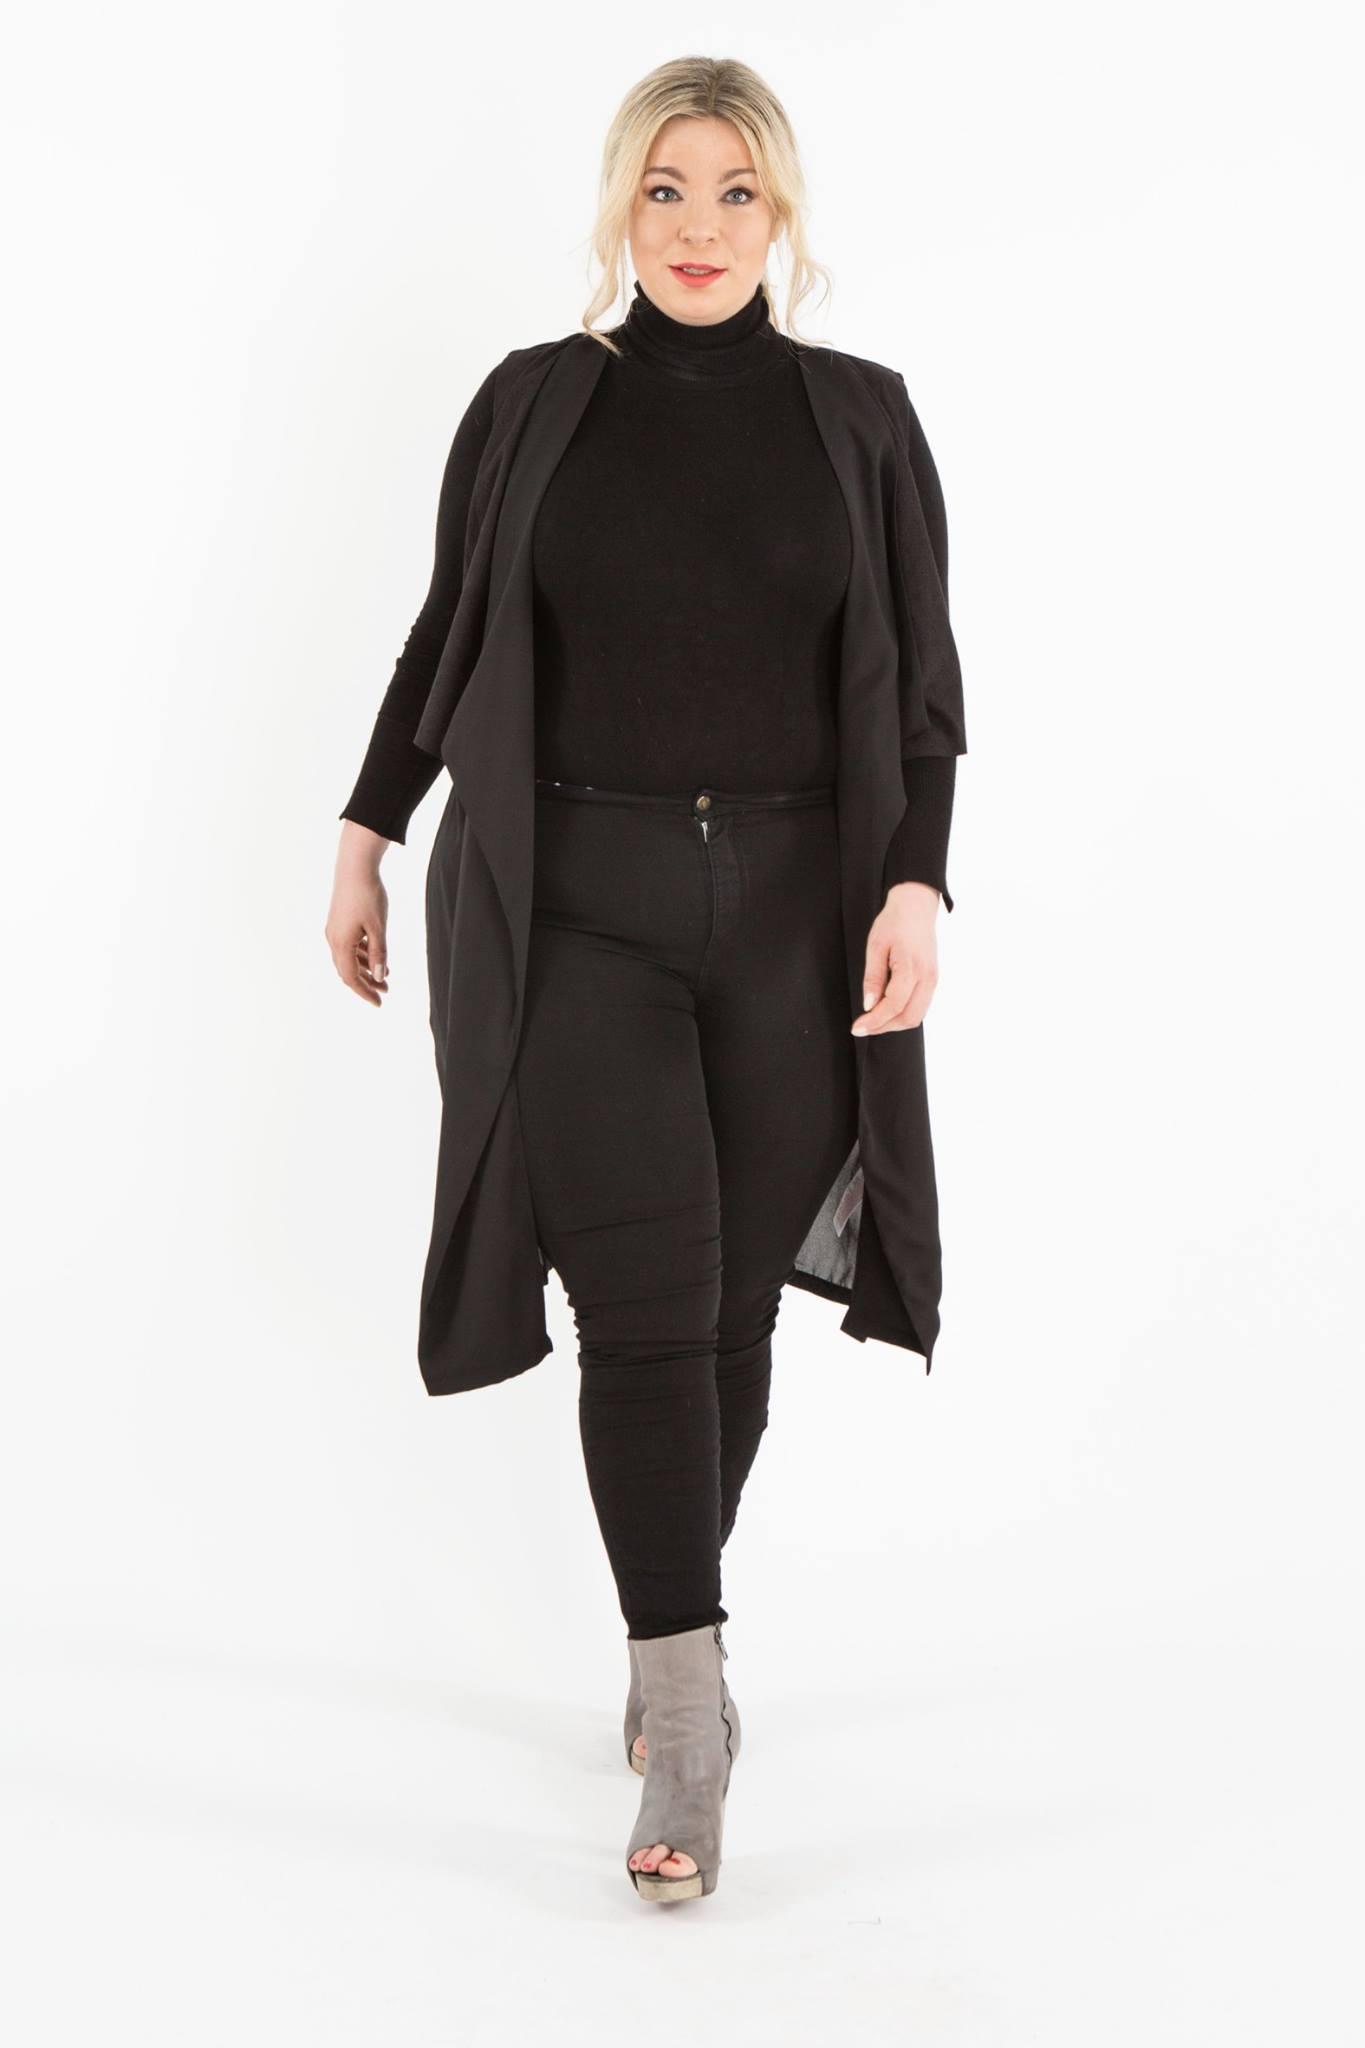 Plussize-Model-Plusmodel-Caterina-pogorzelski-Megabambi-Onlineshop-Job